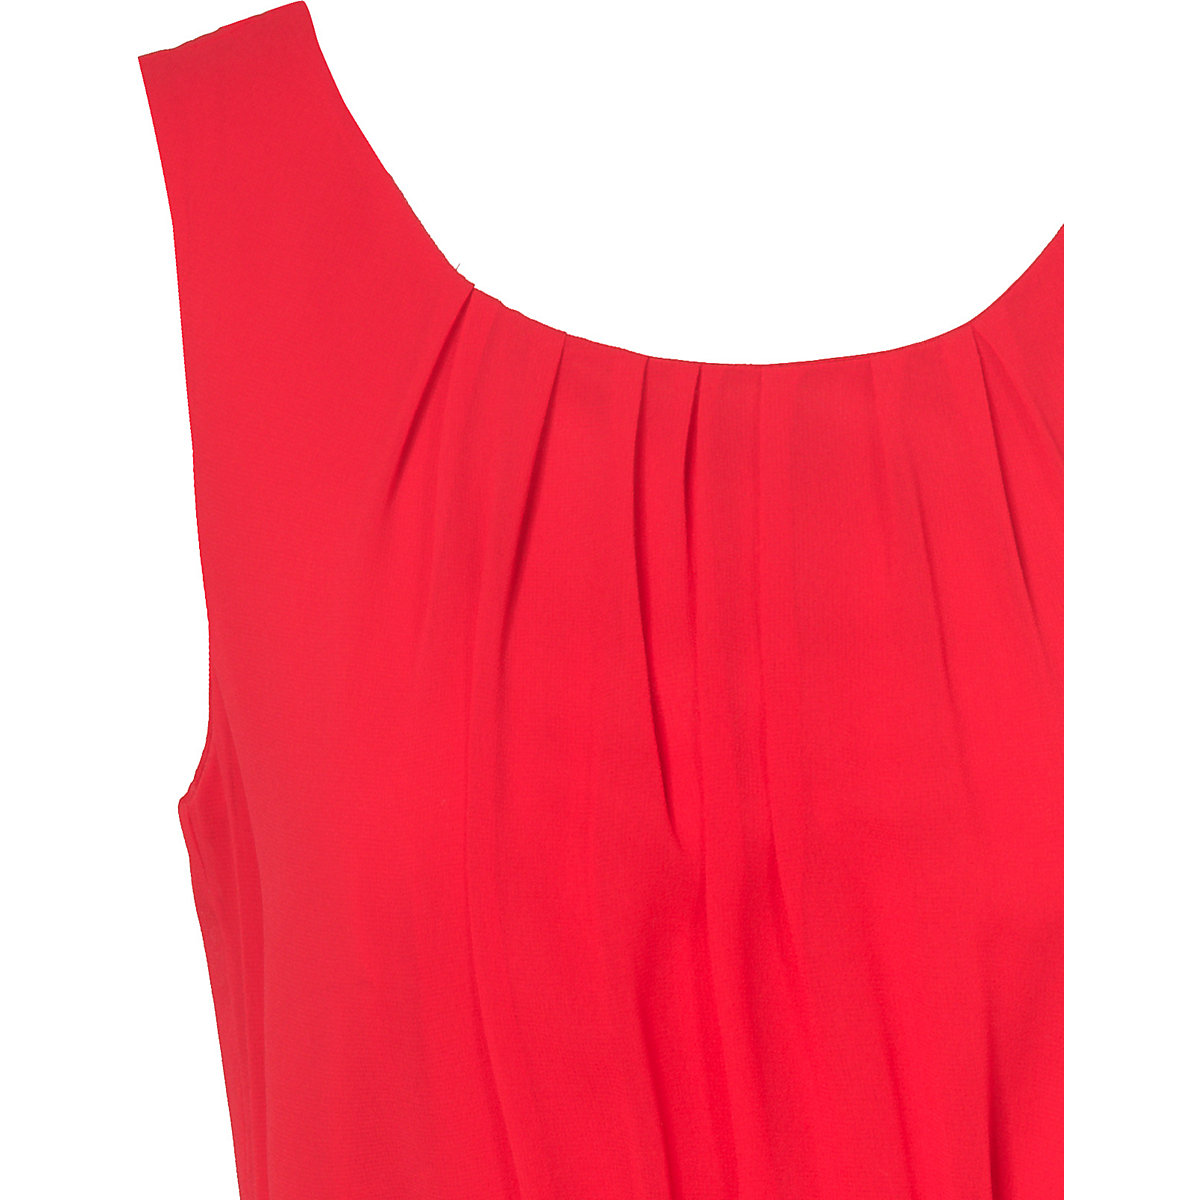 ESPRIT collection, Kleid, rot | mirapodo